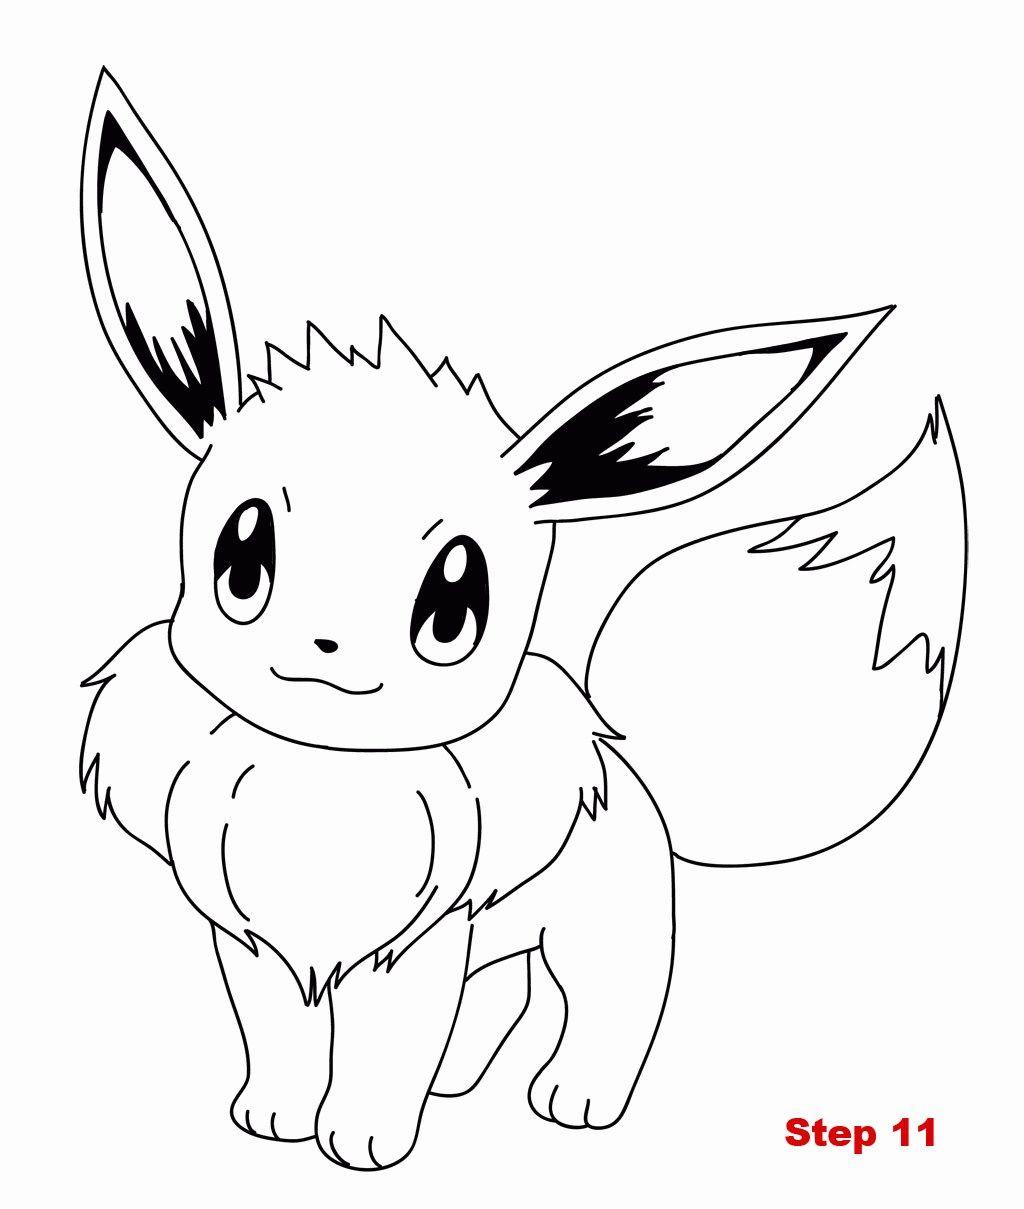 Pokemon Coloring Pages Google Search Pokemon Coloring Pages Cartoon Coloring Pages Pokemon Coloring